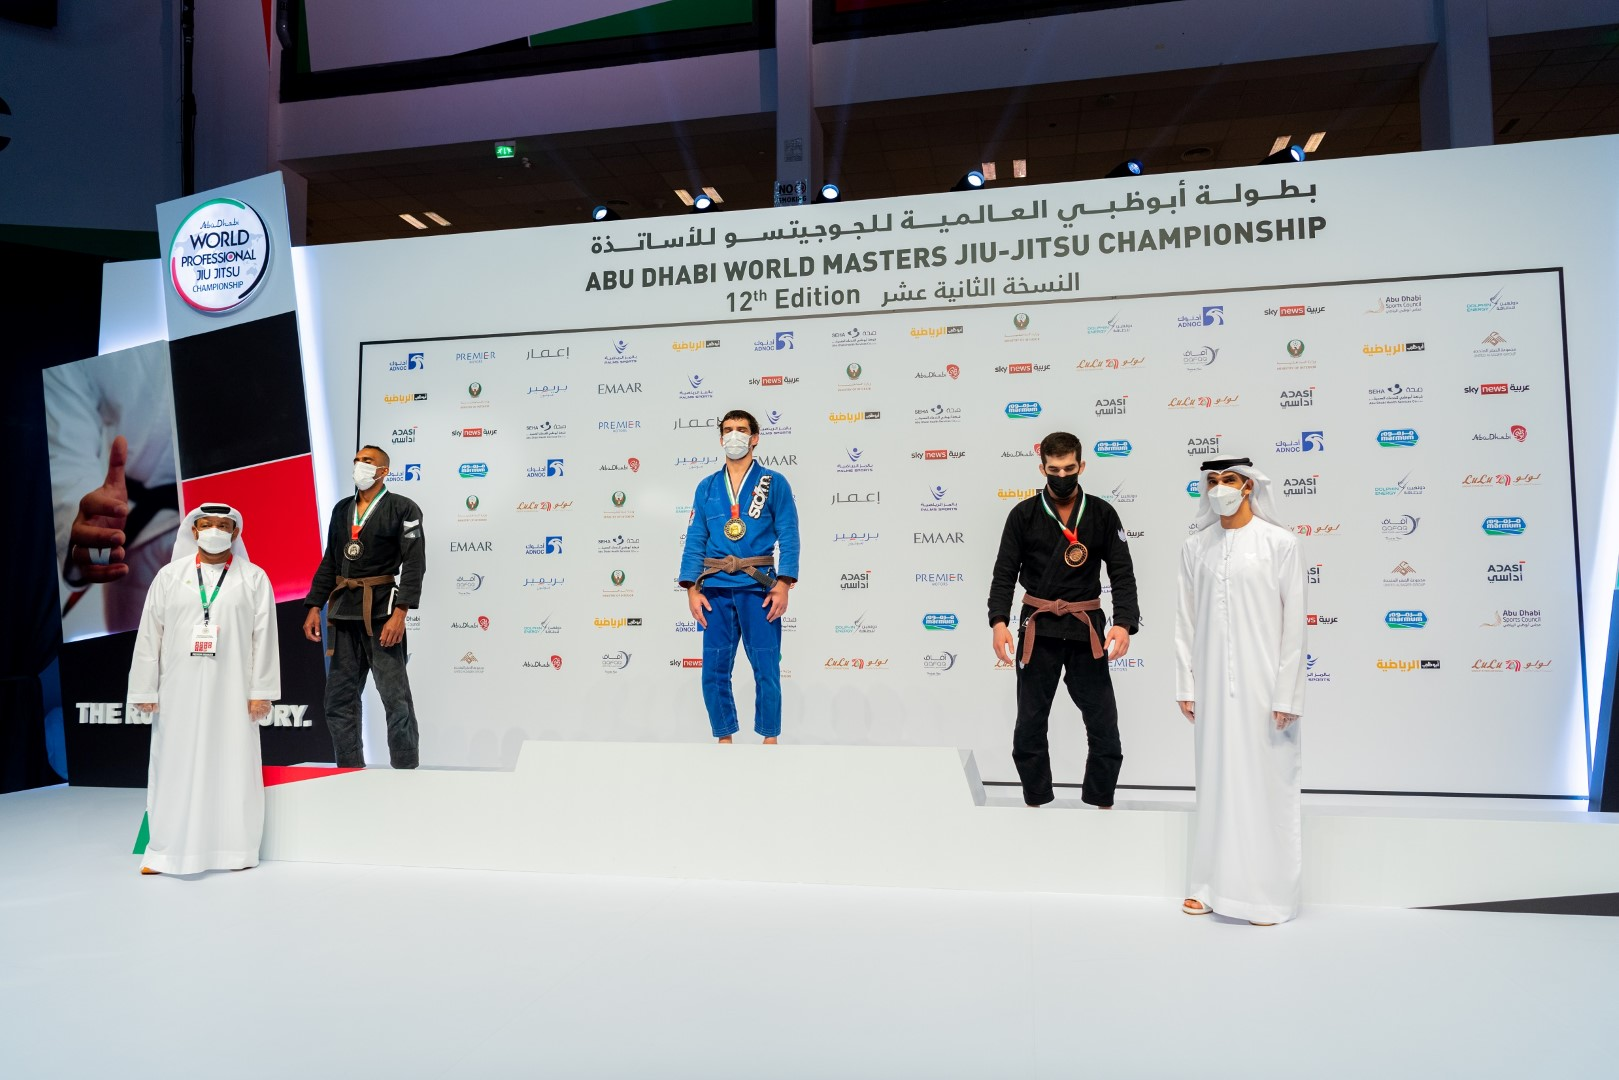 World Professional Jiu-Jitsu Championship kicks off in Abu Dhabi